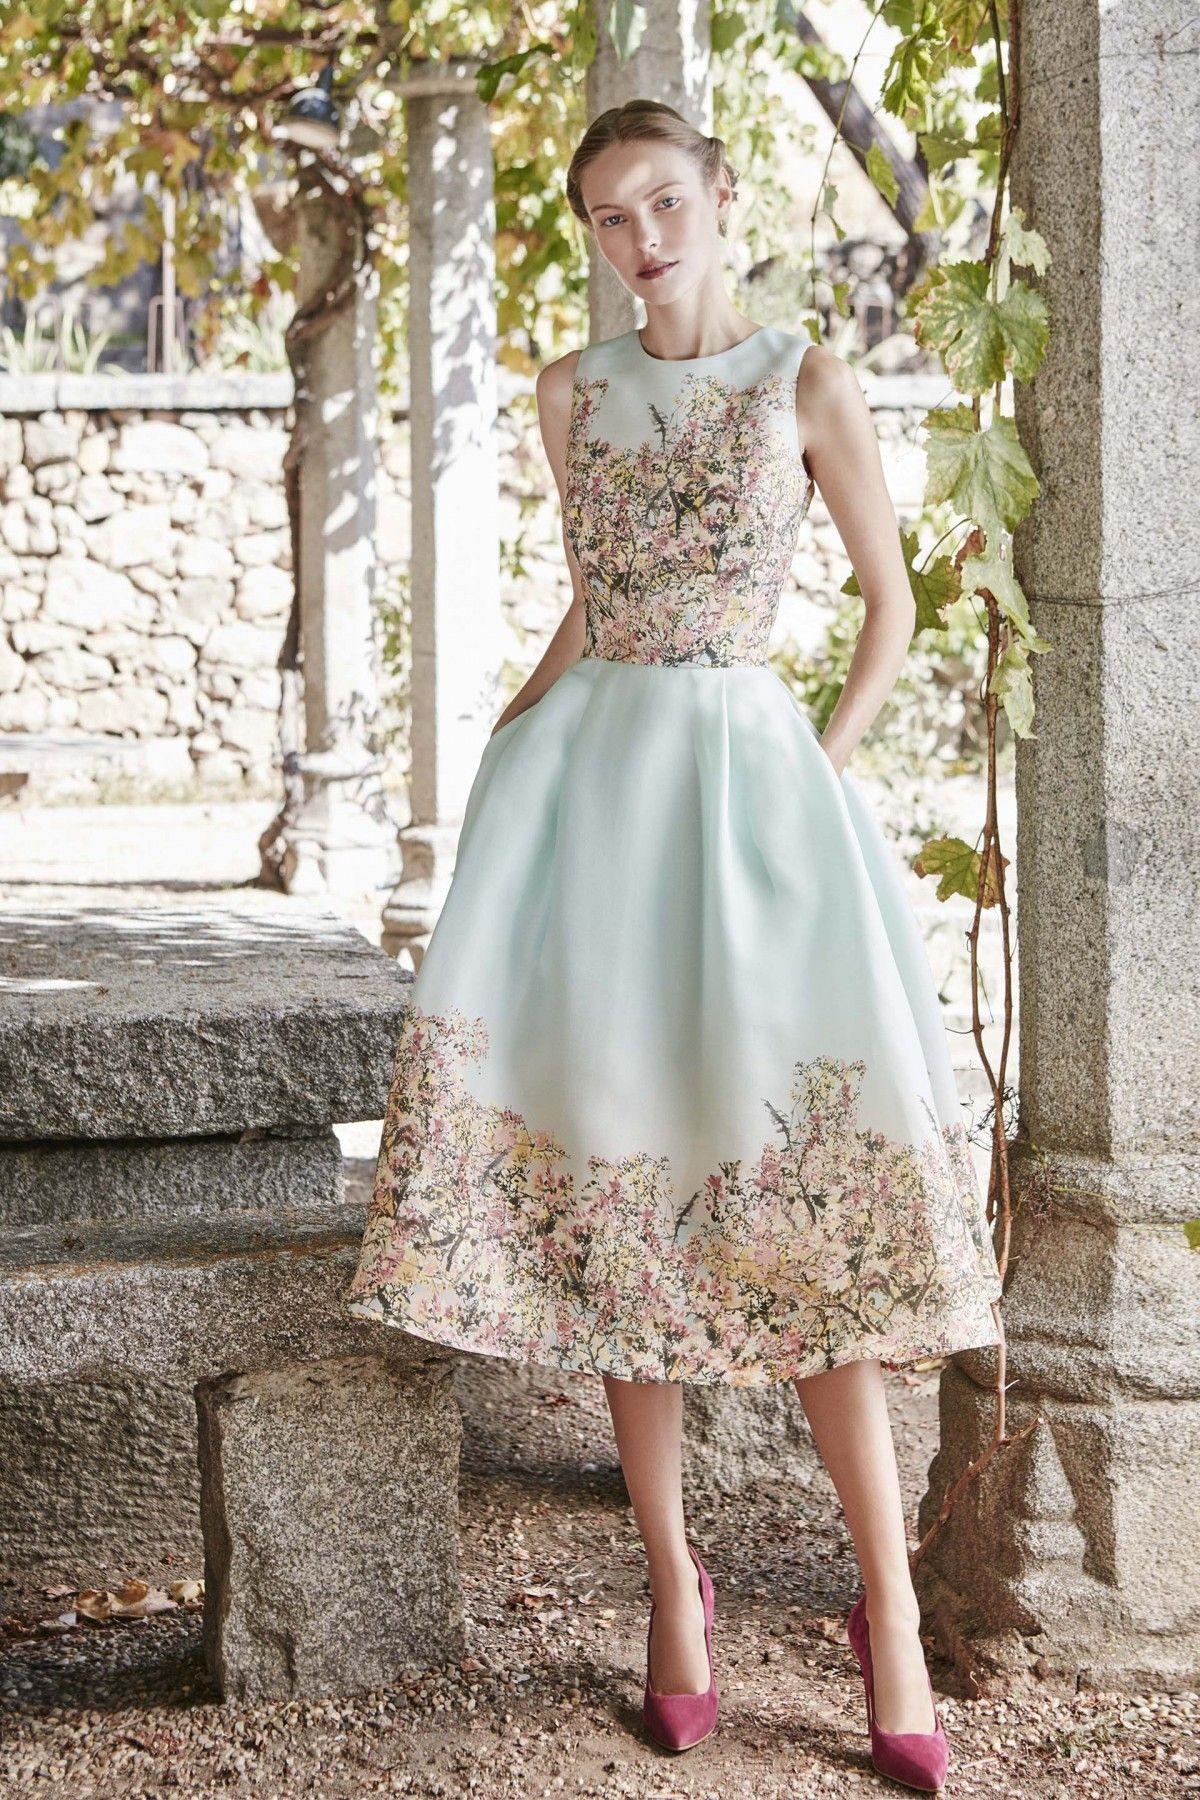 Dolores Promesas Primavera 2017 Elegant Dresses Lovely Dresses Floral Dresses Fashion